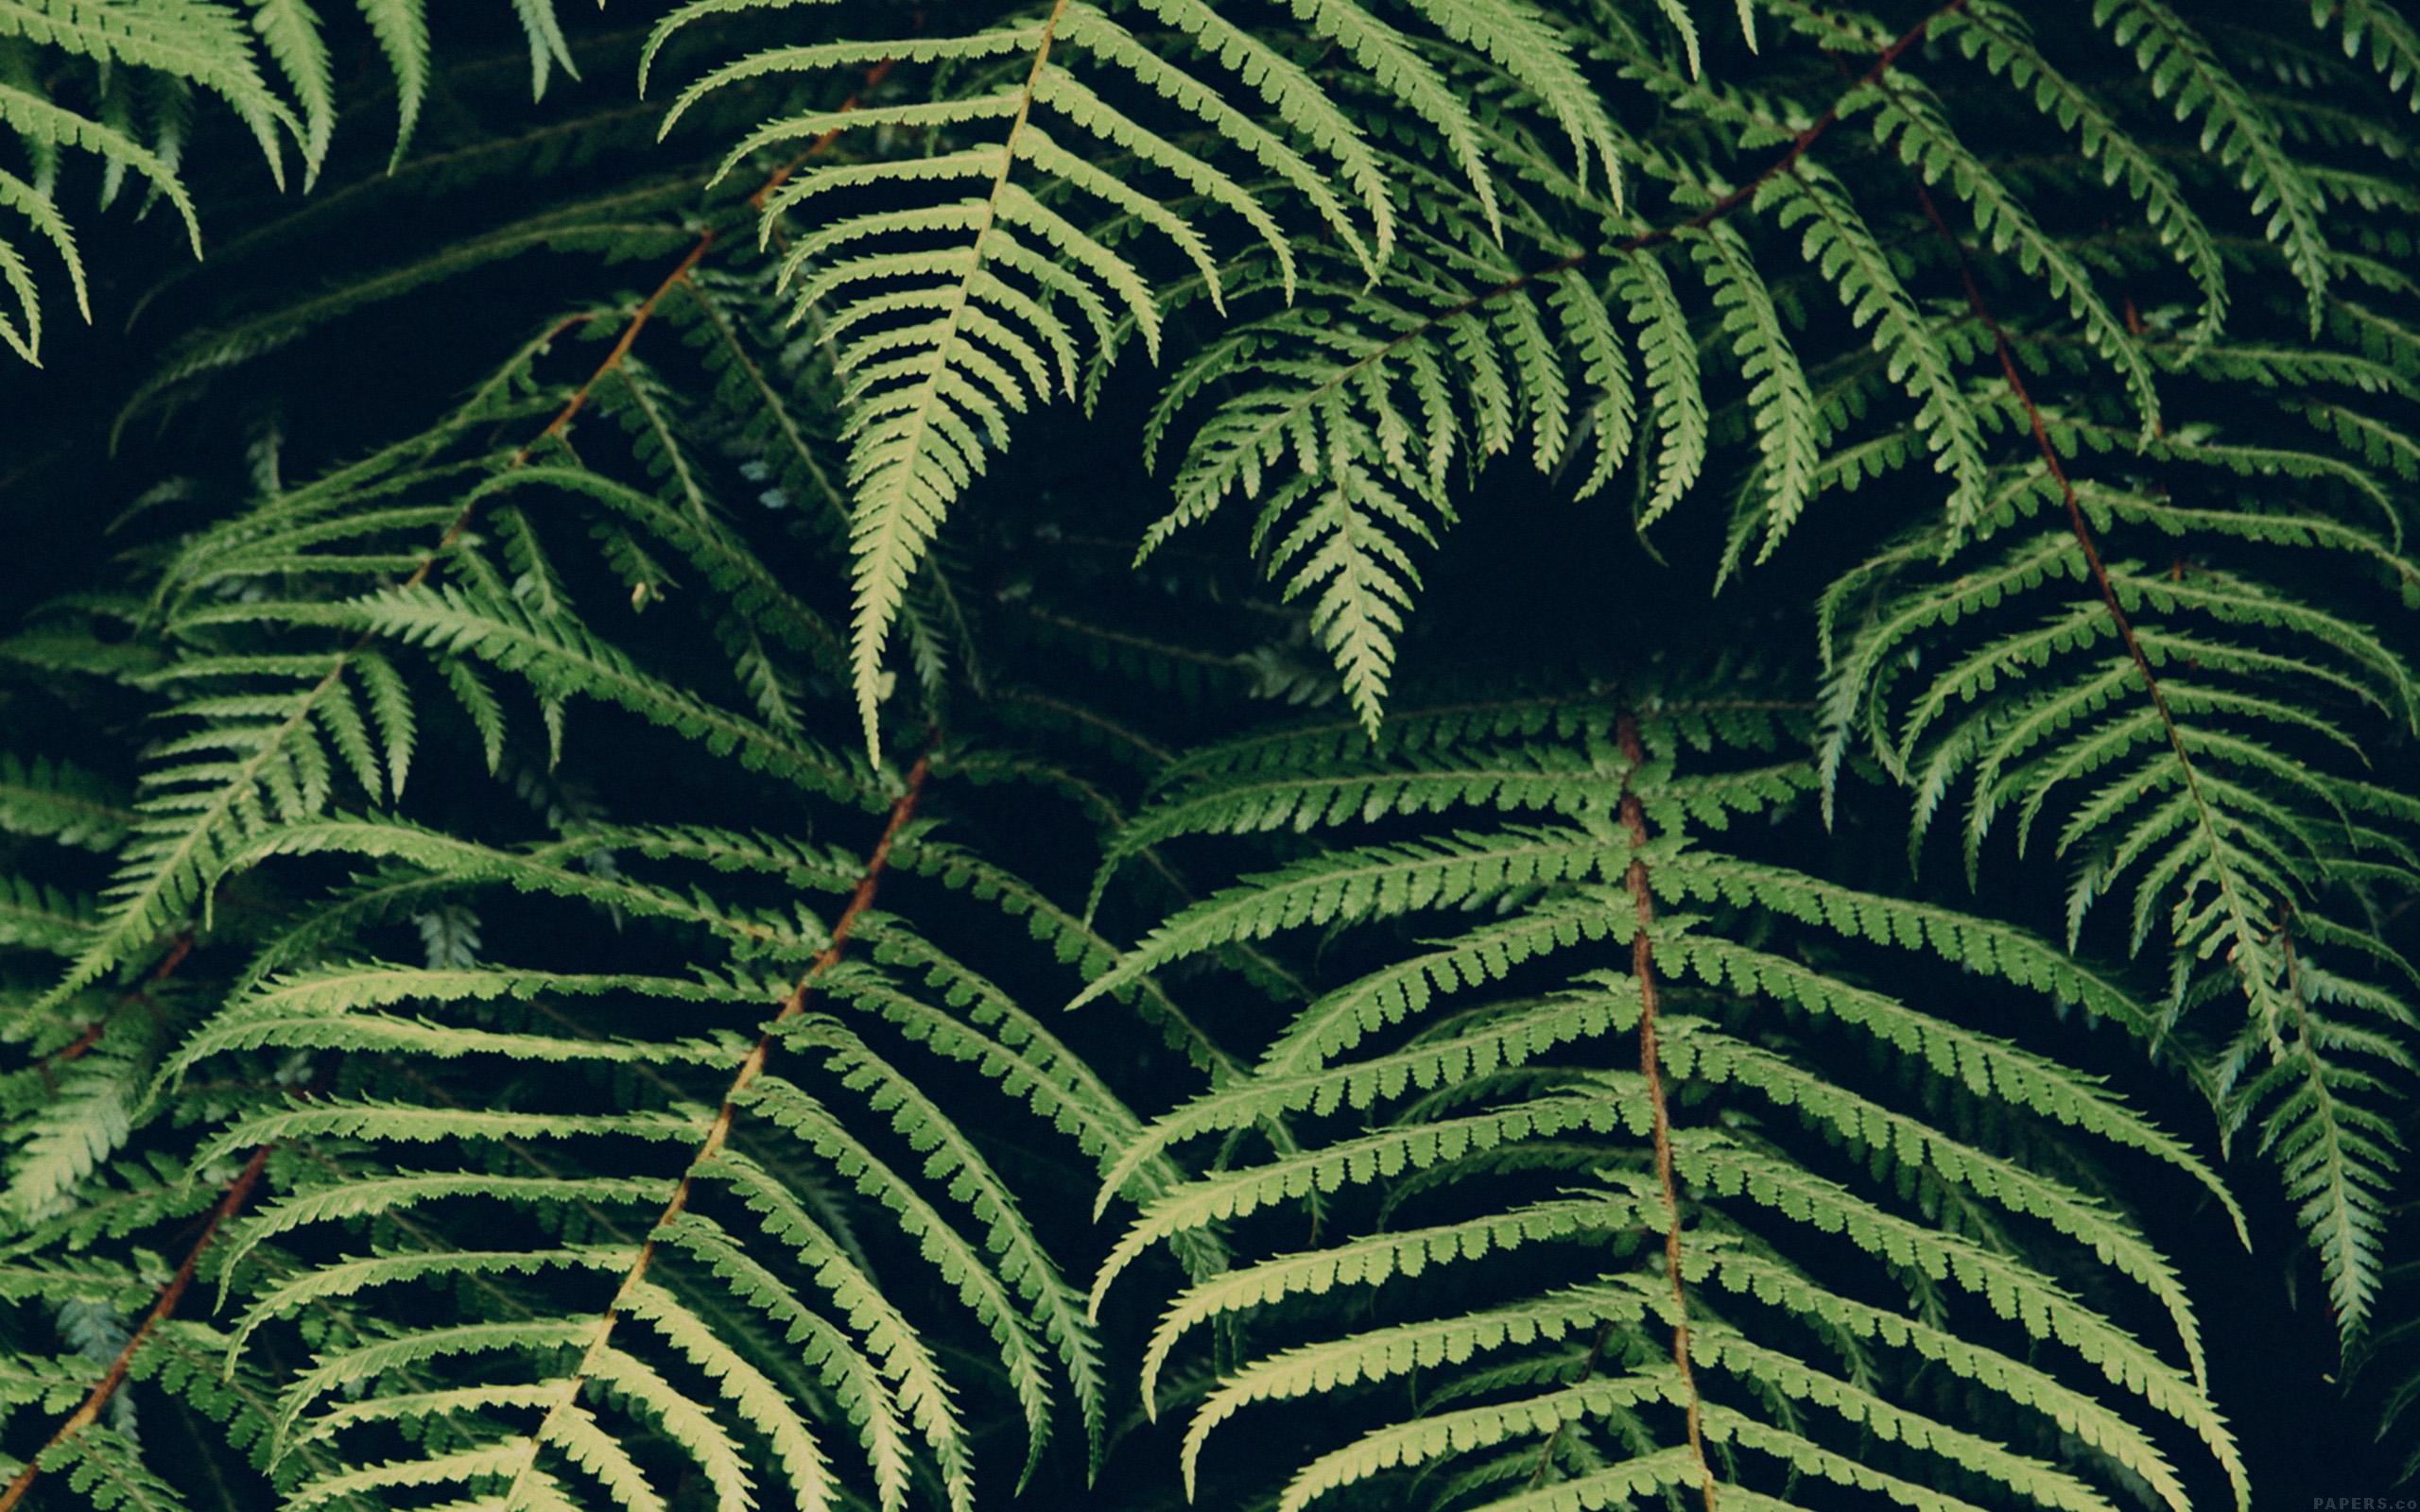 Bet you wish you had 18 phones now. mn06-leaf-green-dark-nature-jan-erik-waider-wallpaper